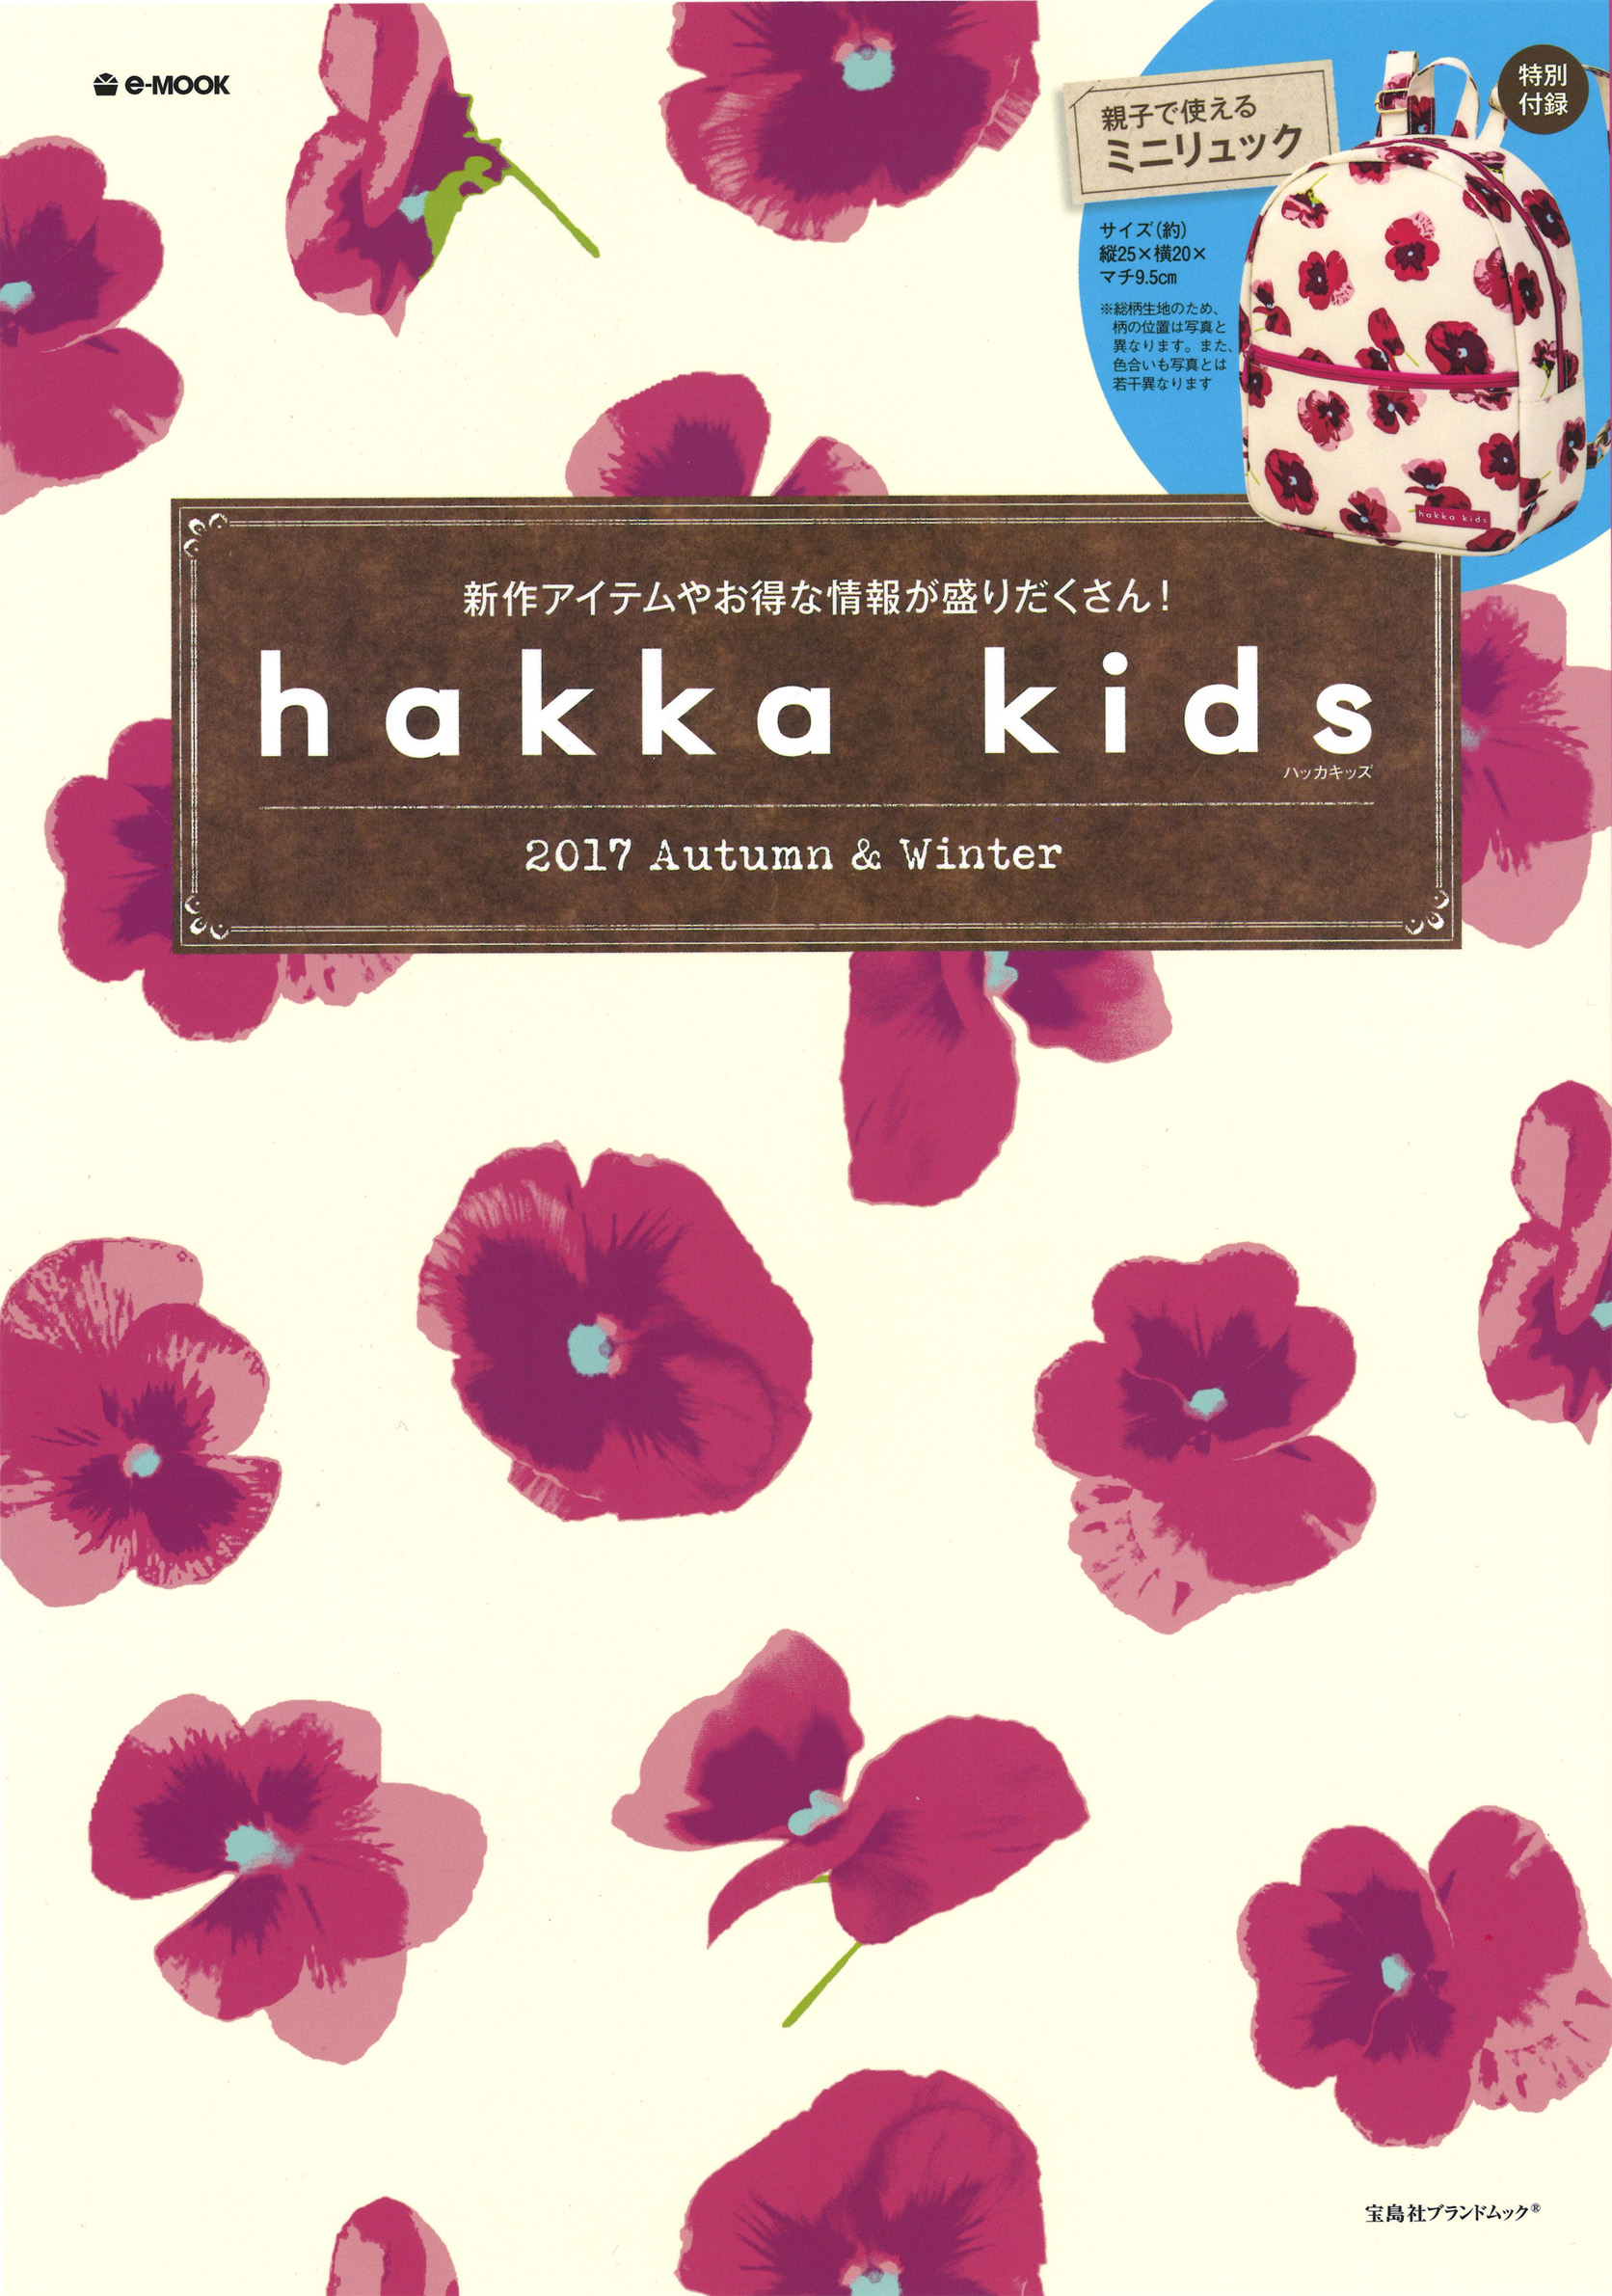 e-MOOK「hakka kids」特別付録付き_表紙a